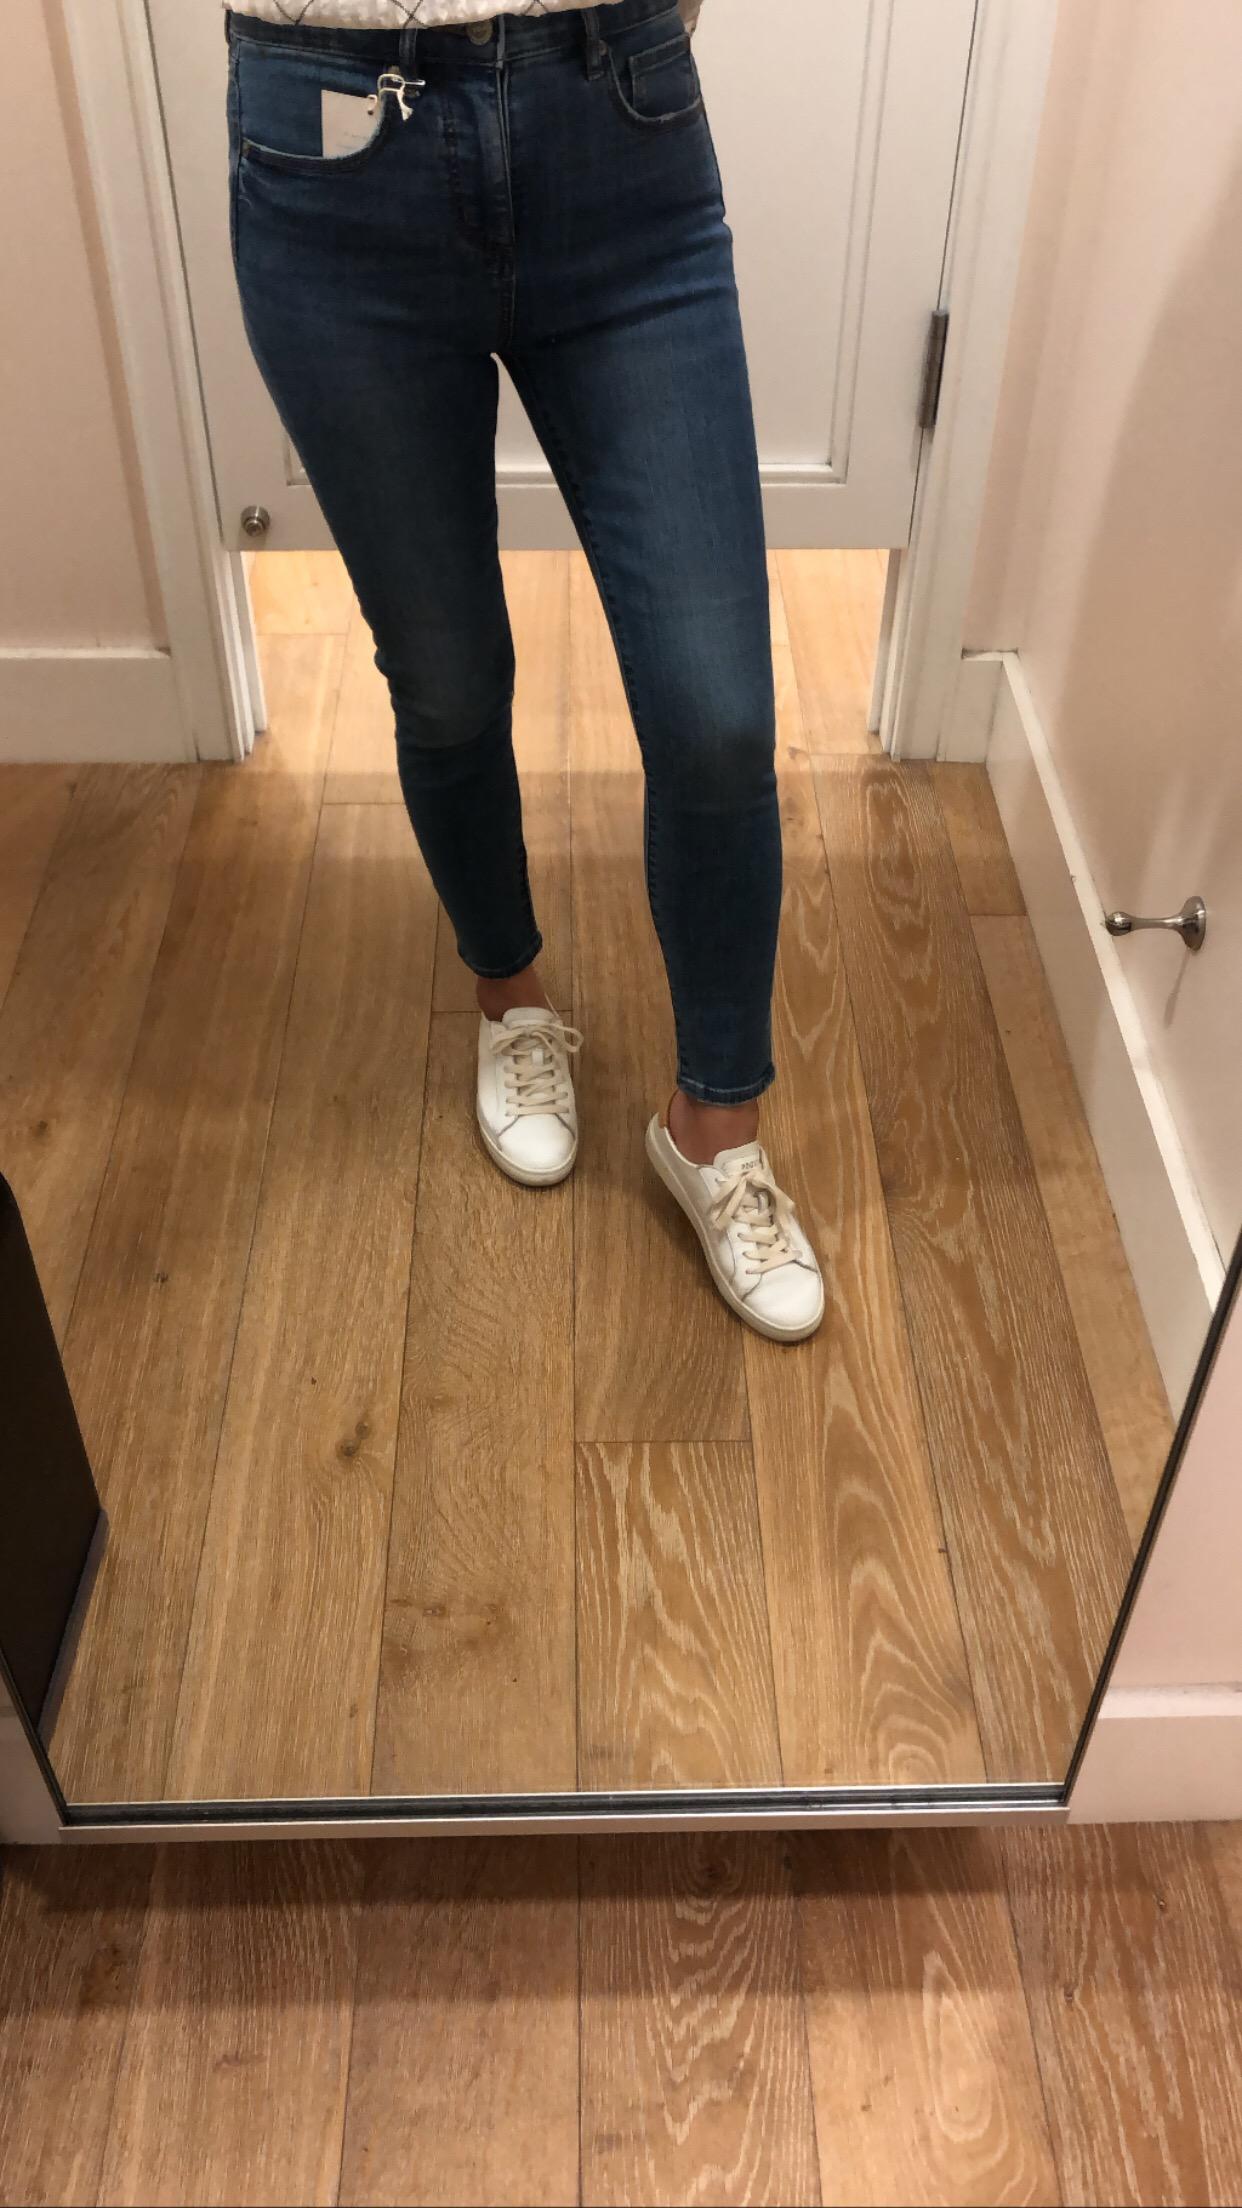 LOFT High Rise Slim Pocket Skinny Jeans in Original Mid Indigo Wash, size 25/0P